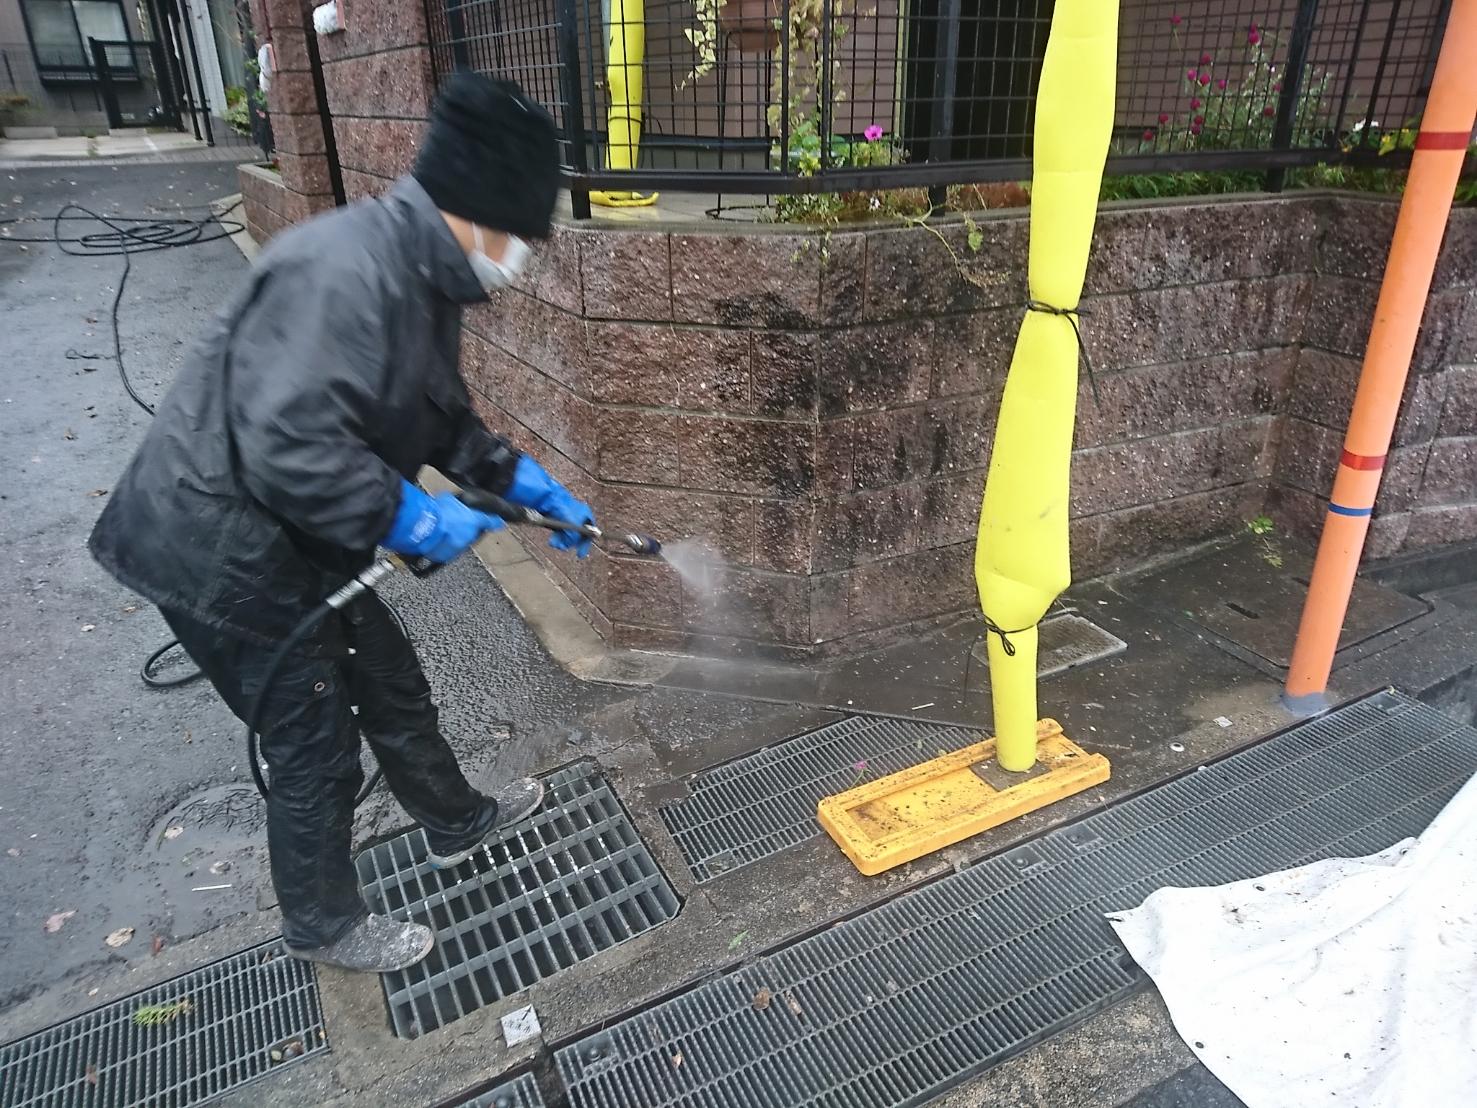 茨木・高槻の外壁屋根塗装防水YJリフォーム塀の高圧洗浄@茨木市南春日丘